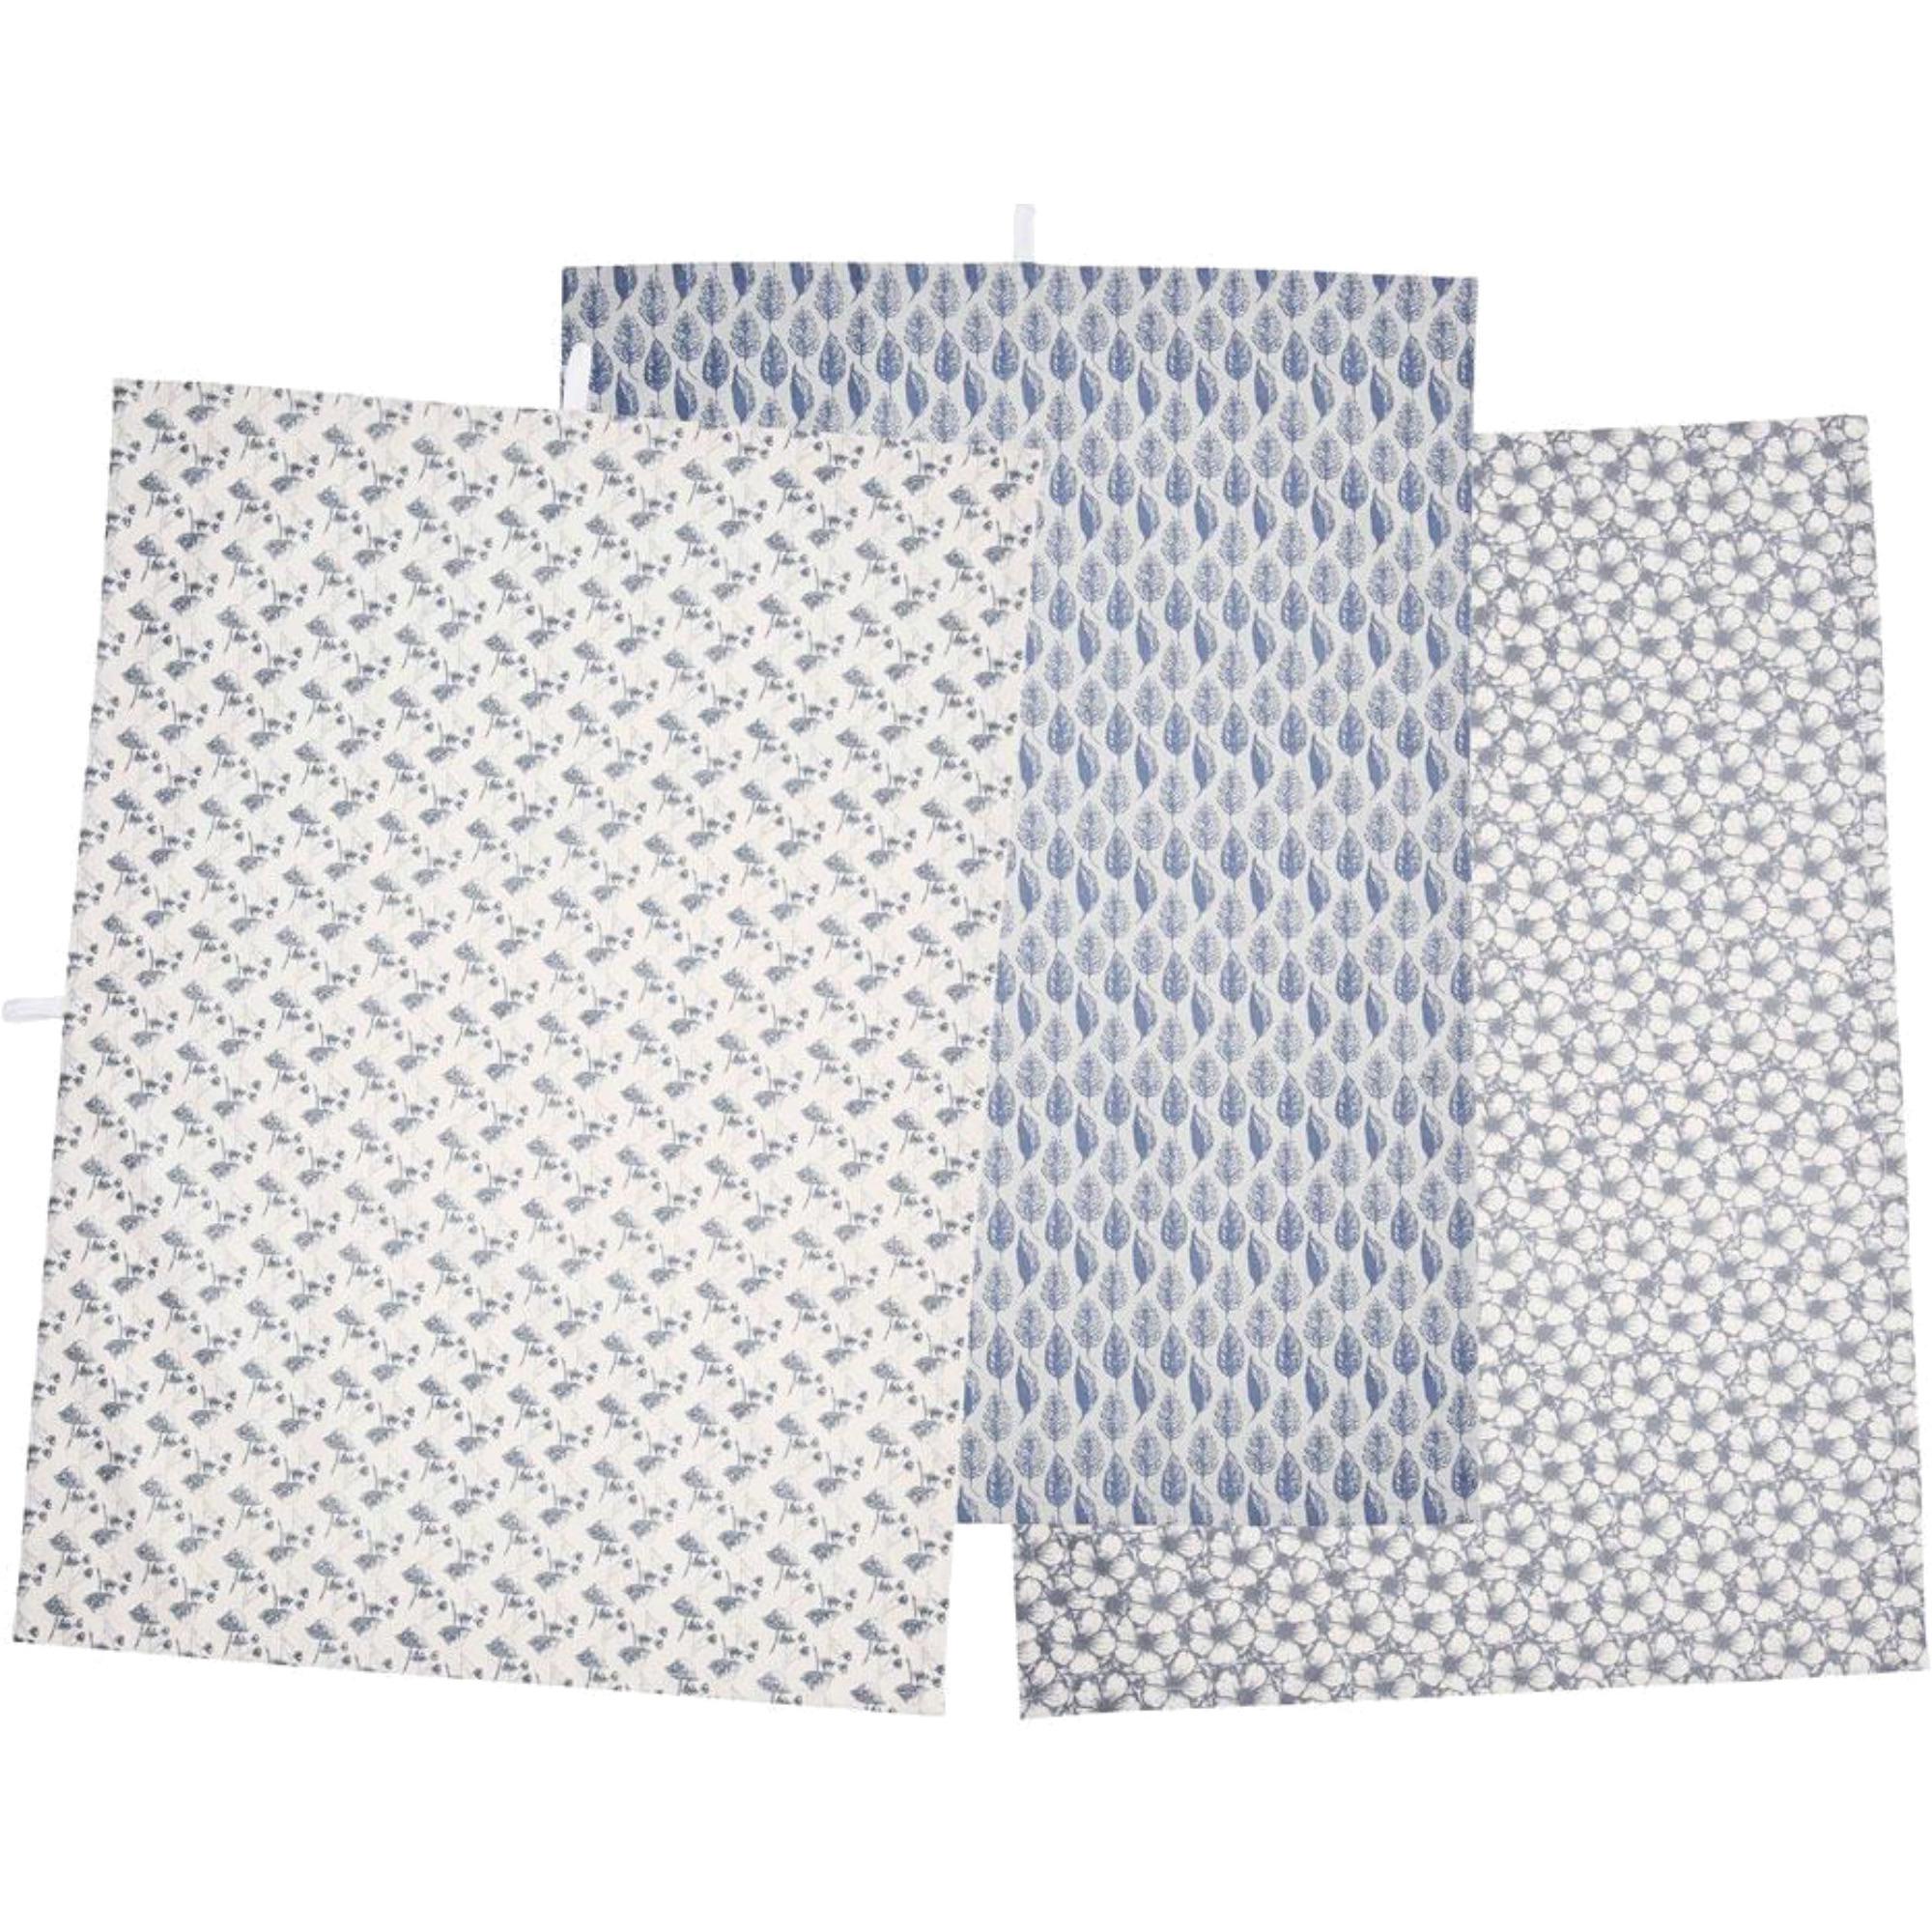 A Simple Mess Kökshandduk Eline 50×70 cm 3-pack